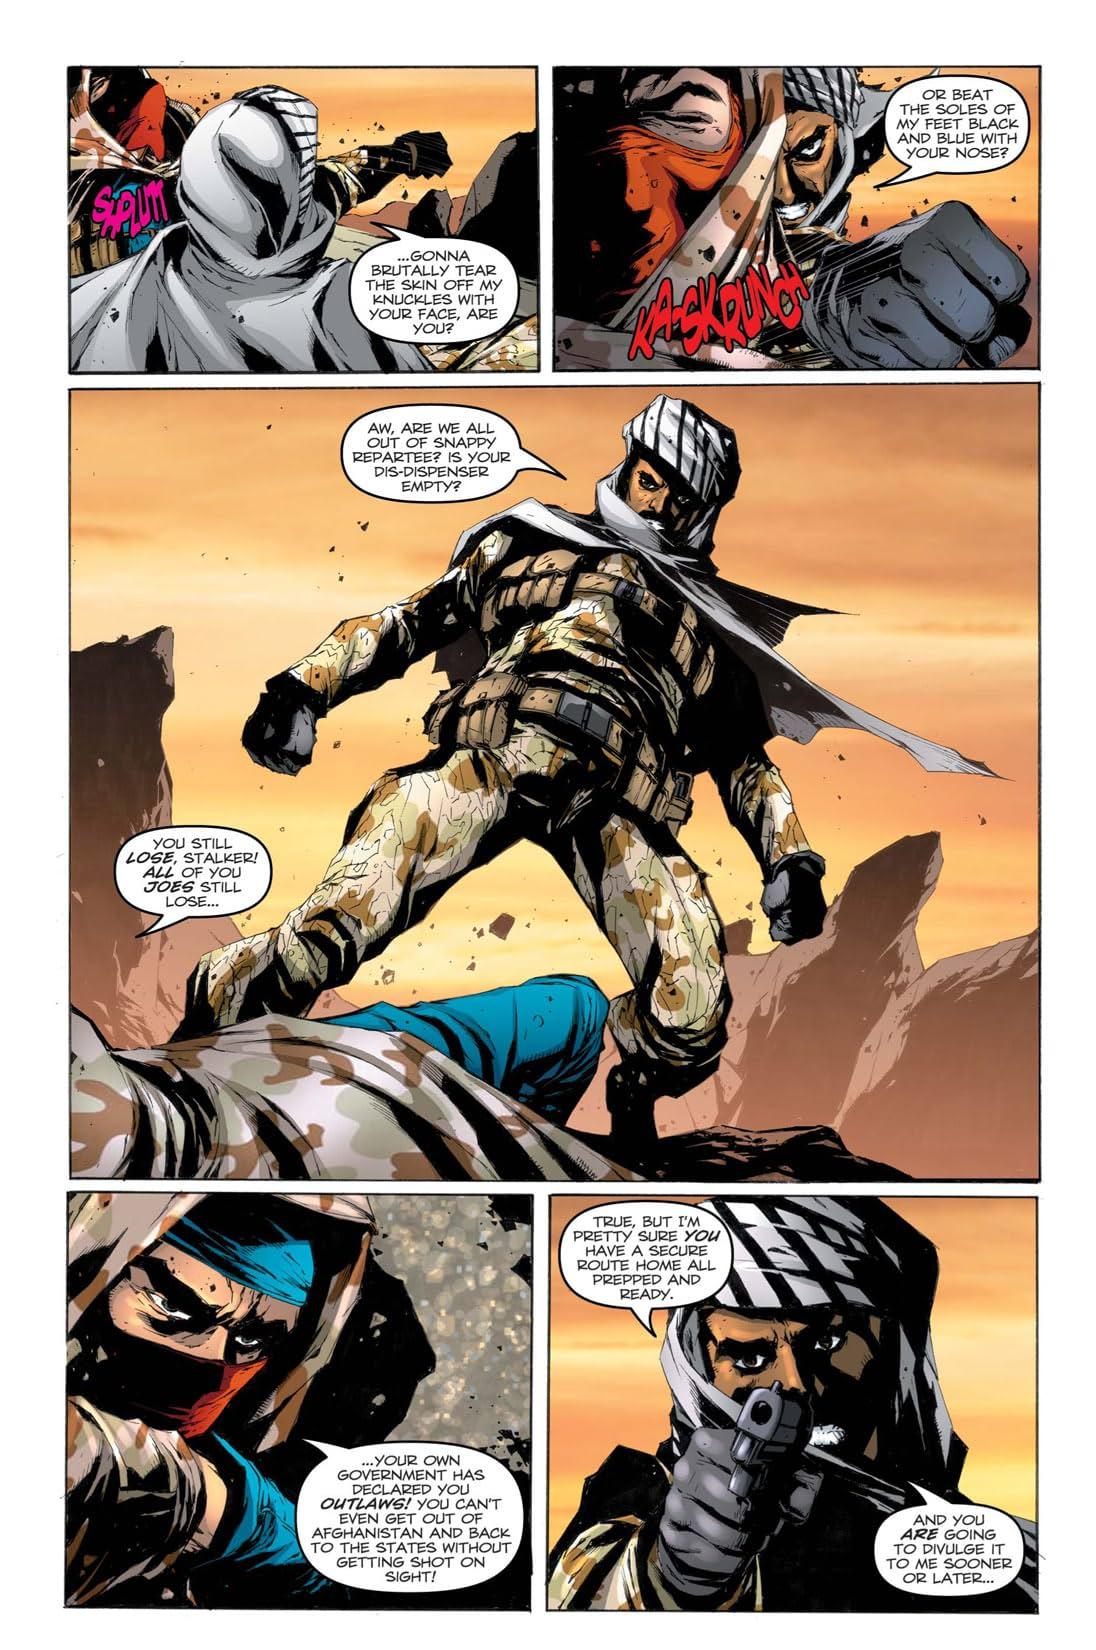 G.I. Joe: A Real American Hero No.157